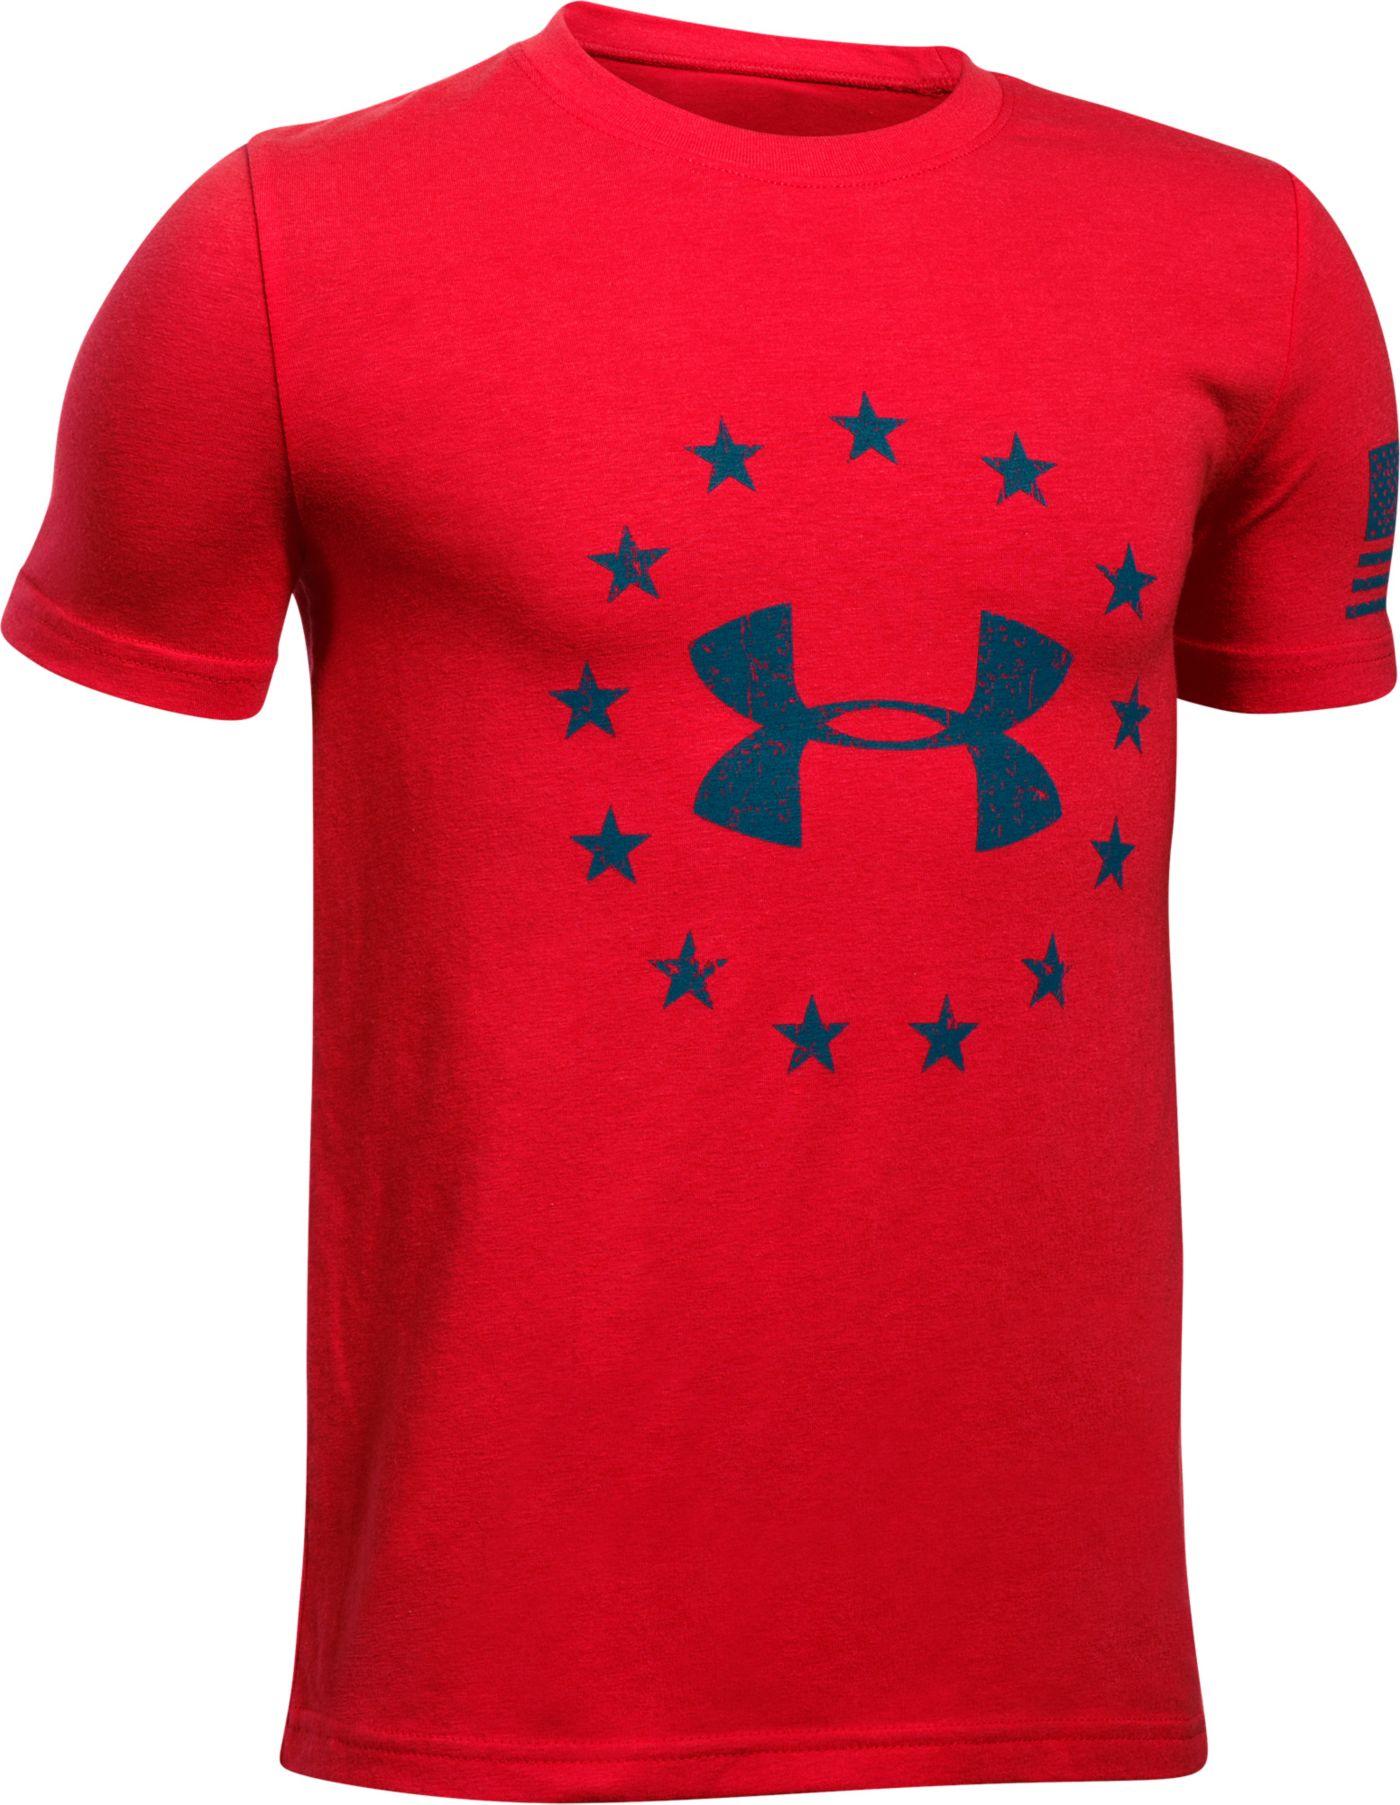 Under Armour Boys' Freedom Logo Short Sleeve T-Shirt